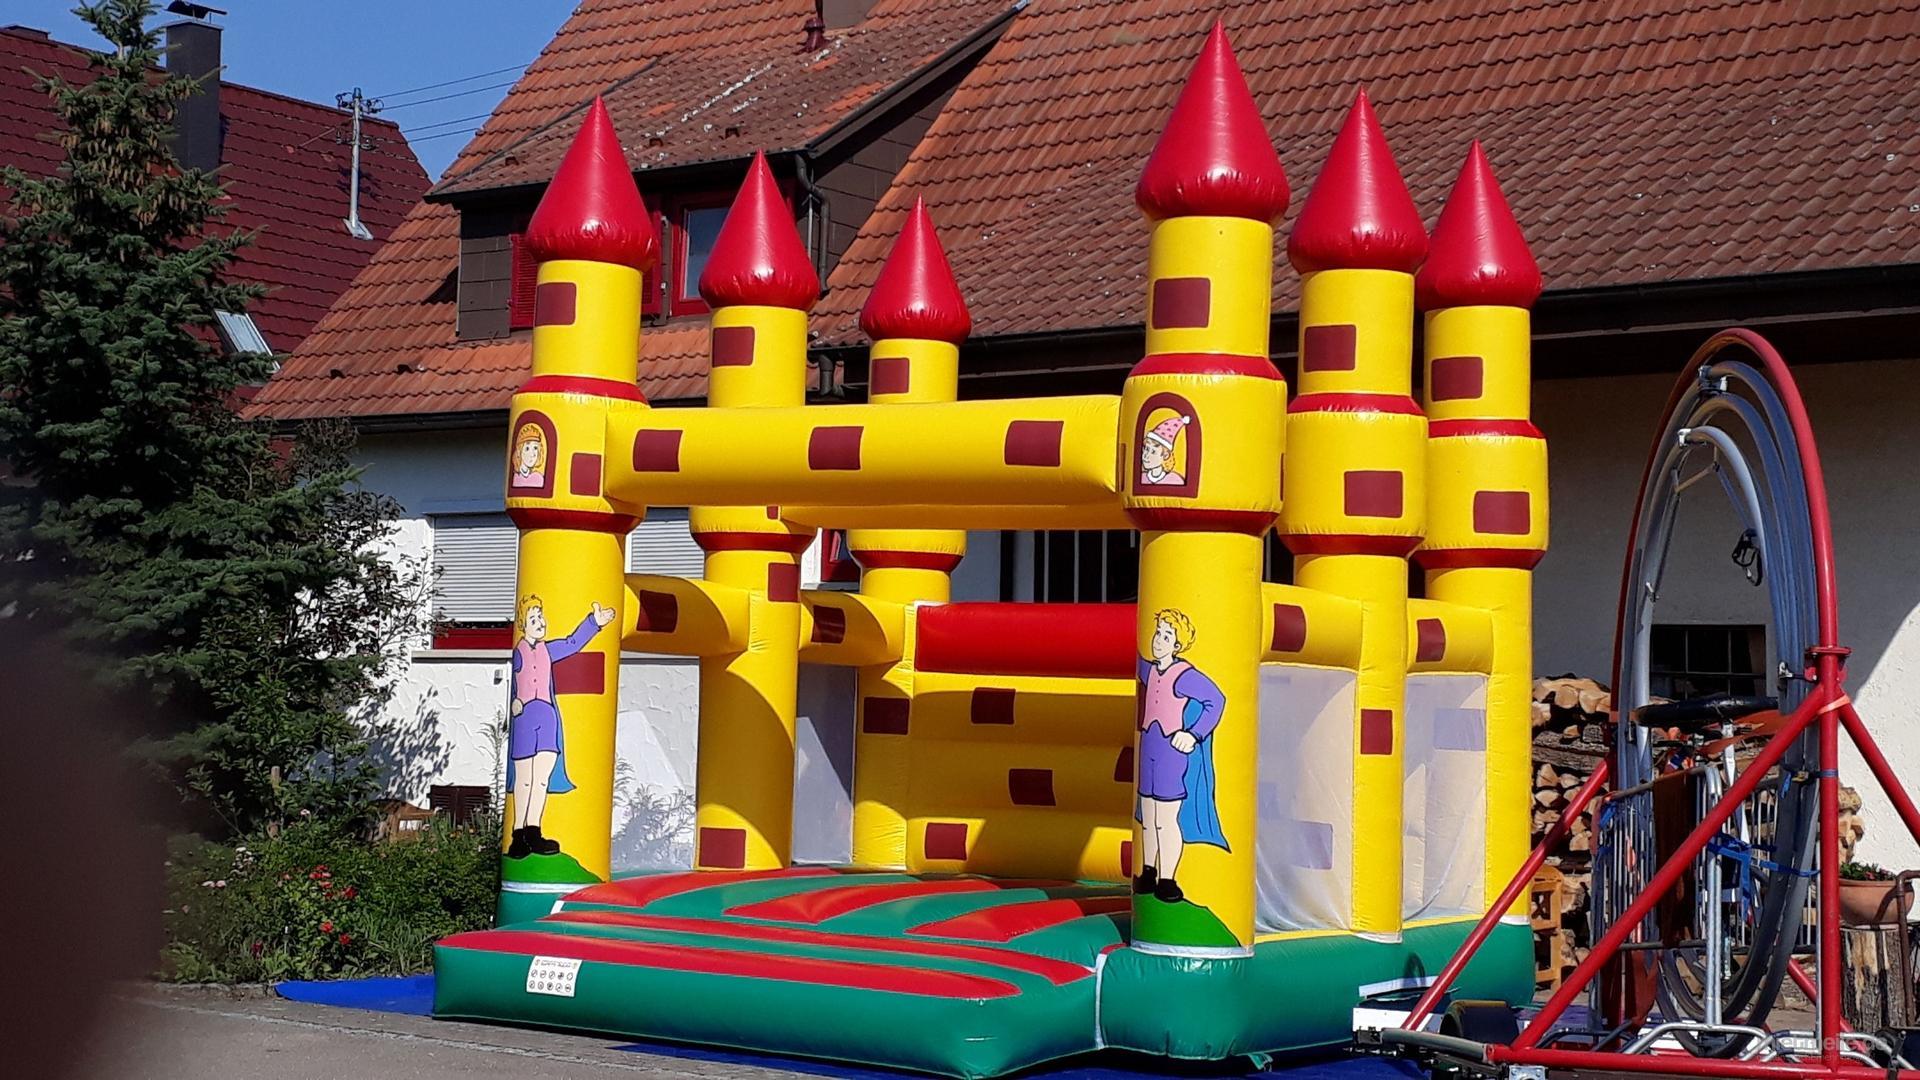 Hüpfburg mieten & vermieten - Profi Hüpfburg (5*5m) günstig mieten in Filderstadt